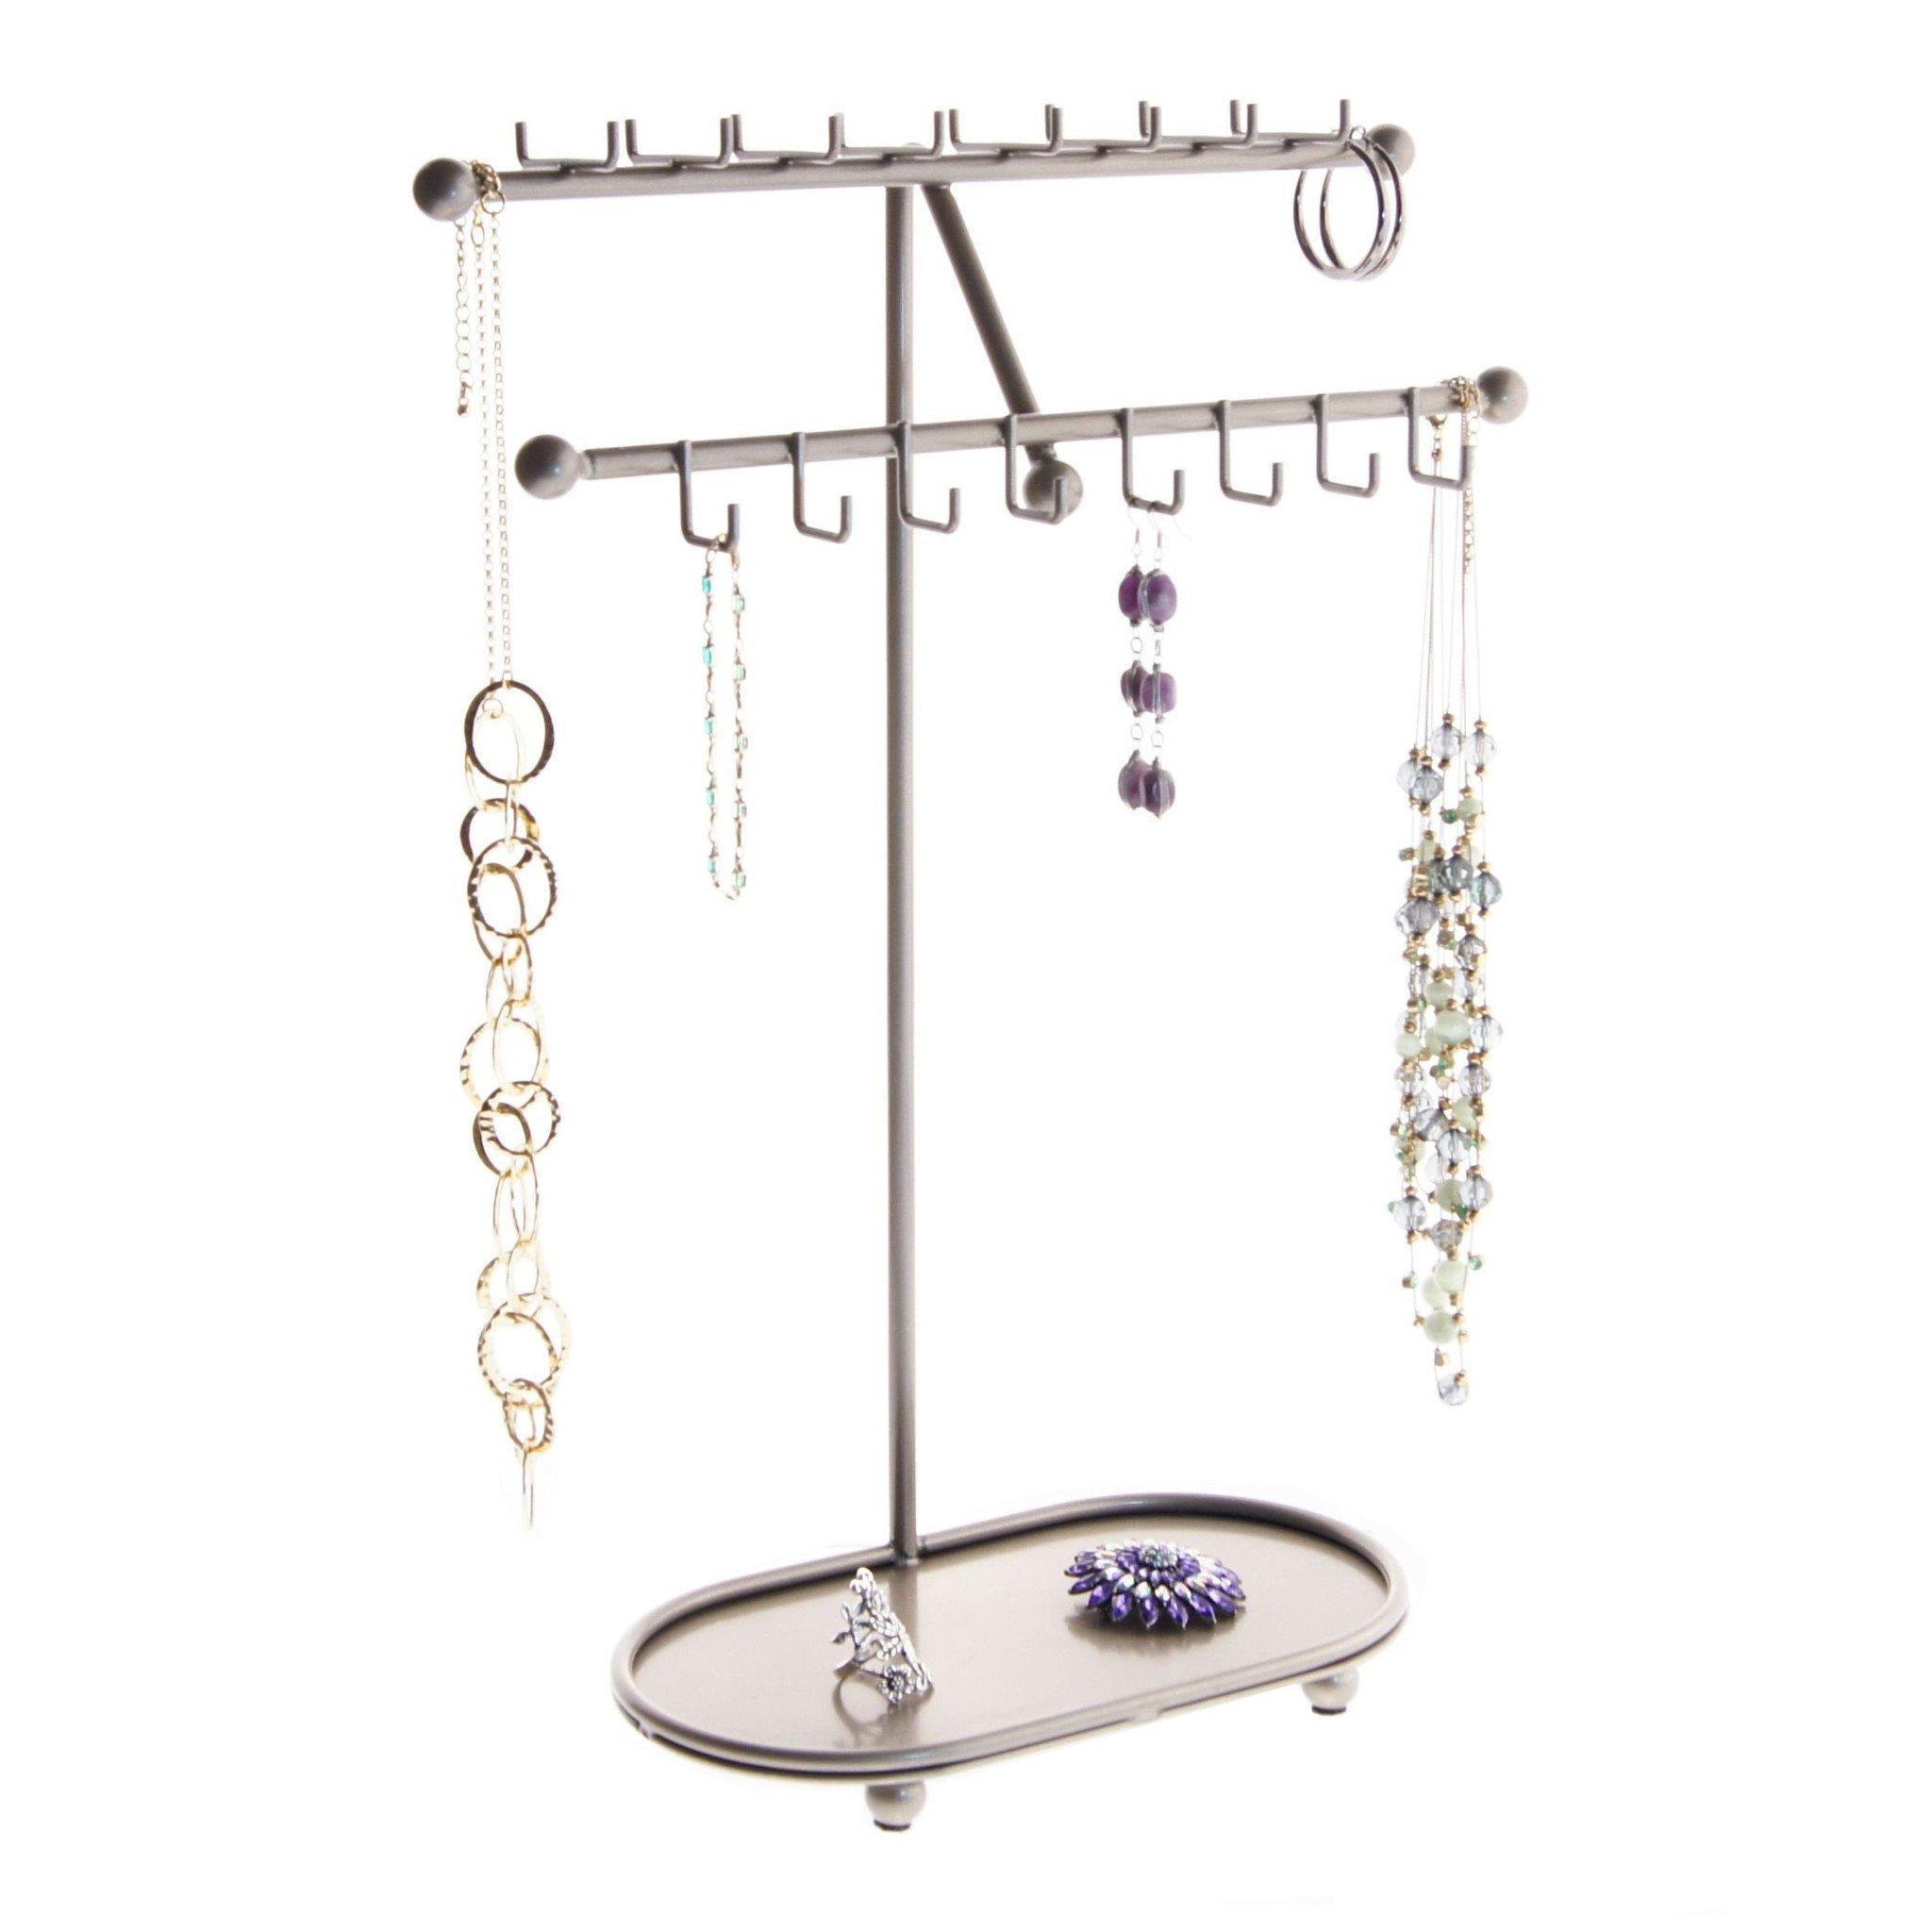 Angelynn's Necklace Holder Organizer Jewelry Tree Stand Storage Rack, Sharisa Satin Nickel Silver by Angelynn's (Image #1)